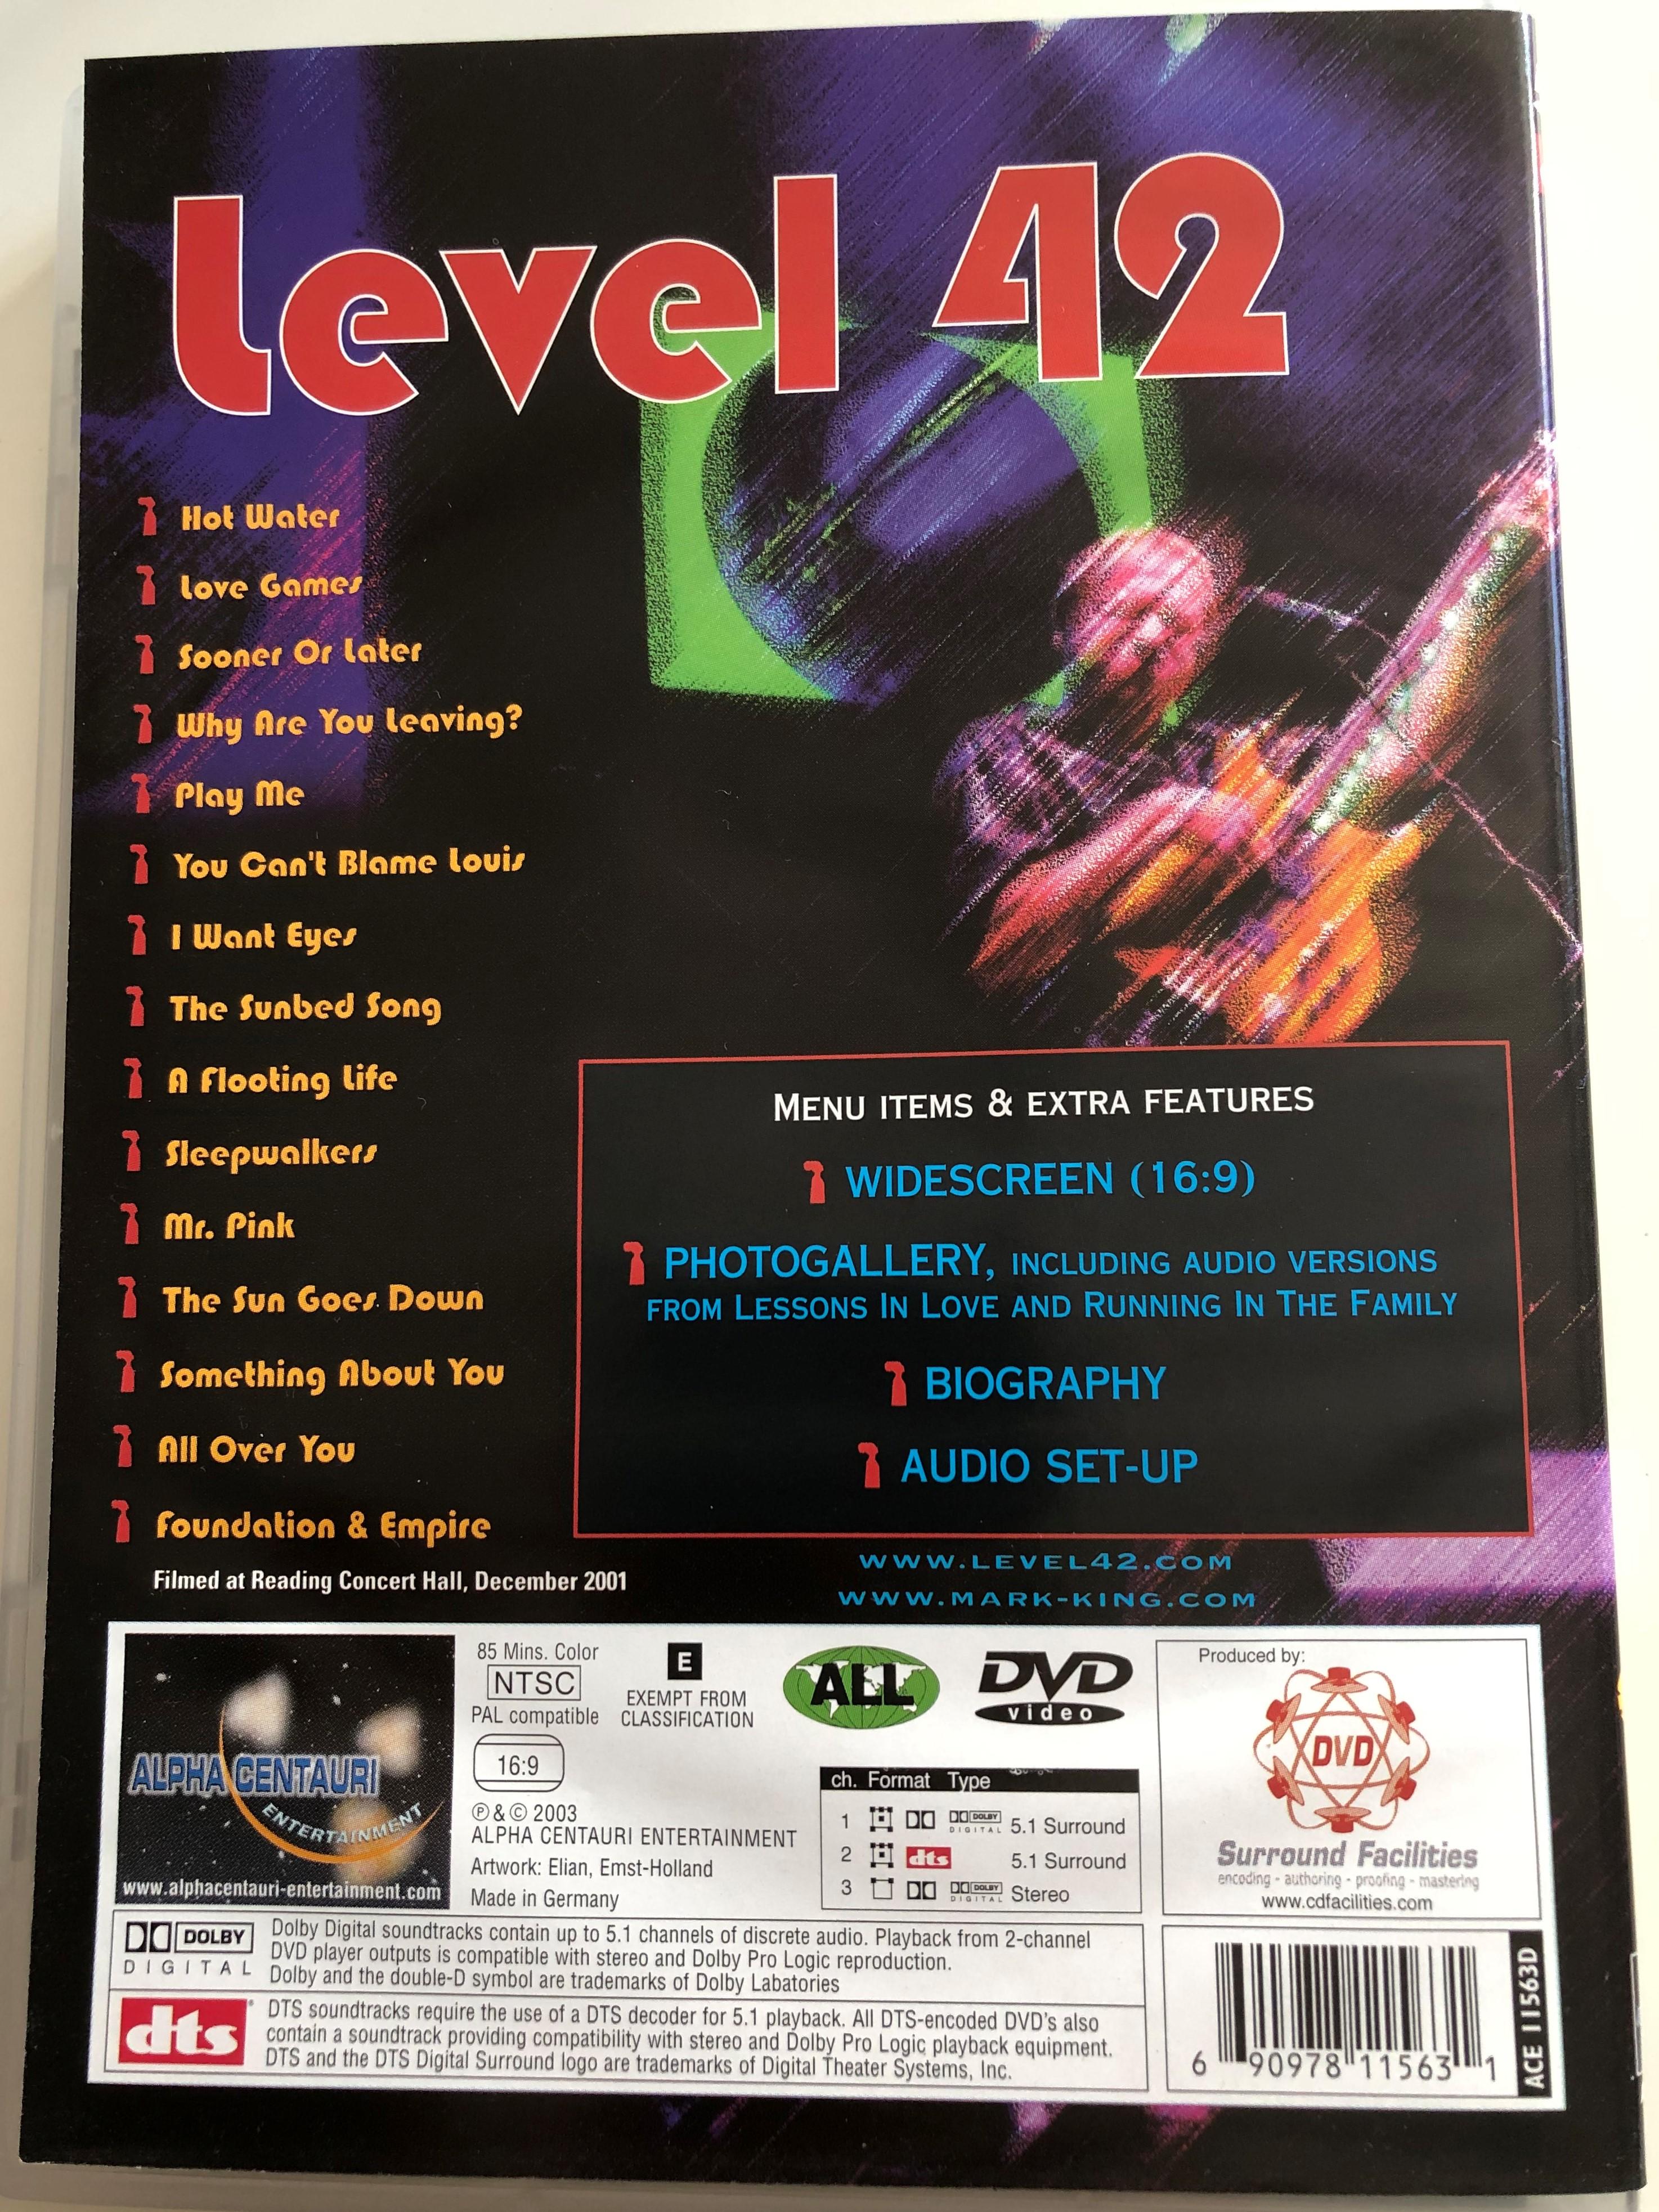 level-42-dvd-2001-live-at-reading-concert-hall-6.jpg